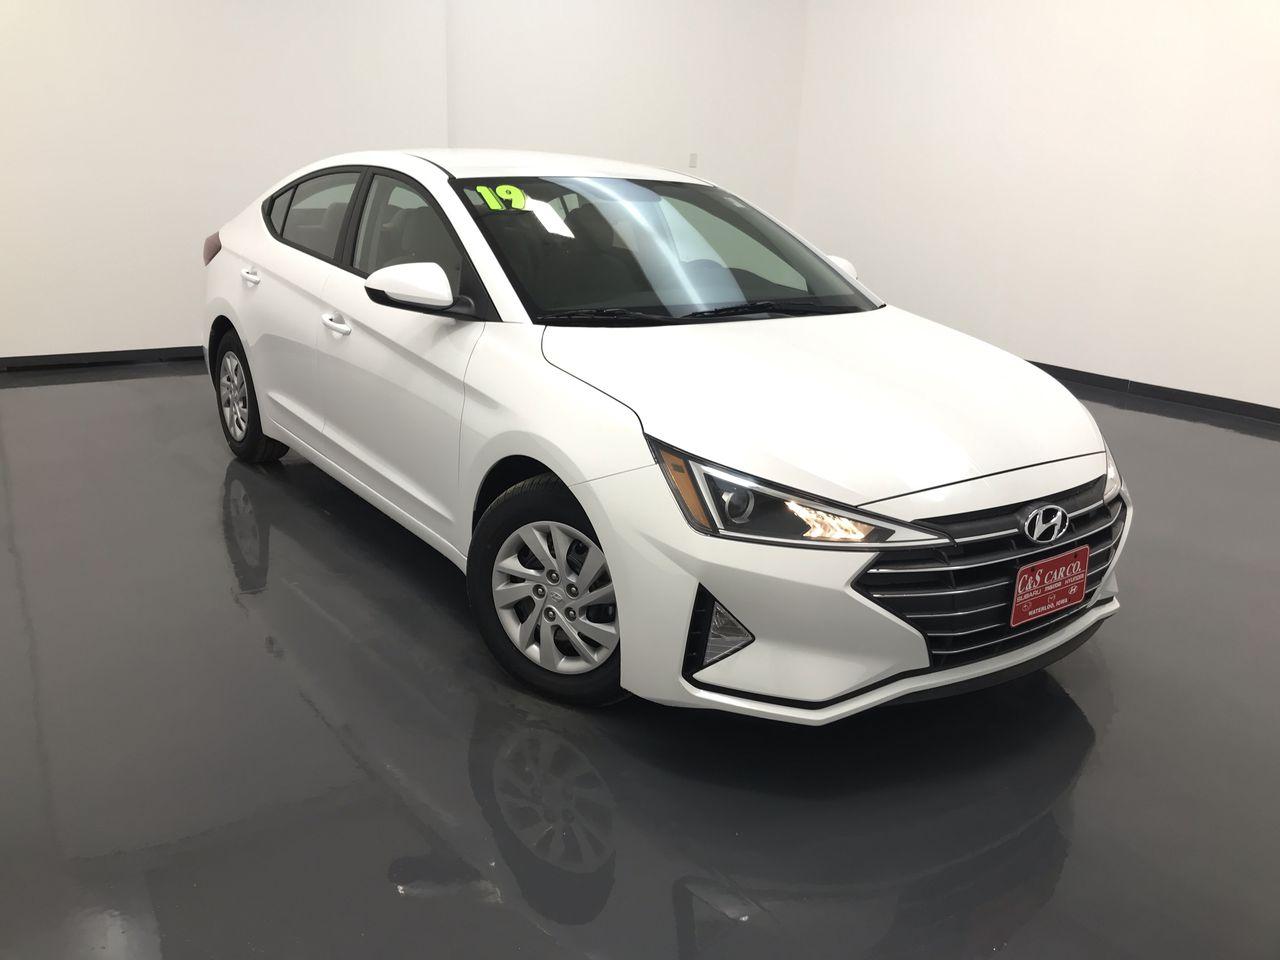 2019 Hyundai Elantra  - C & S Car Company